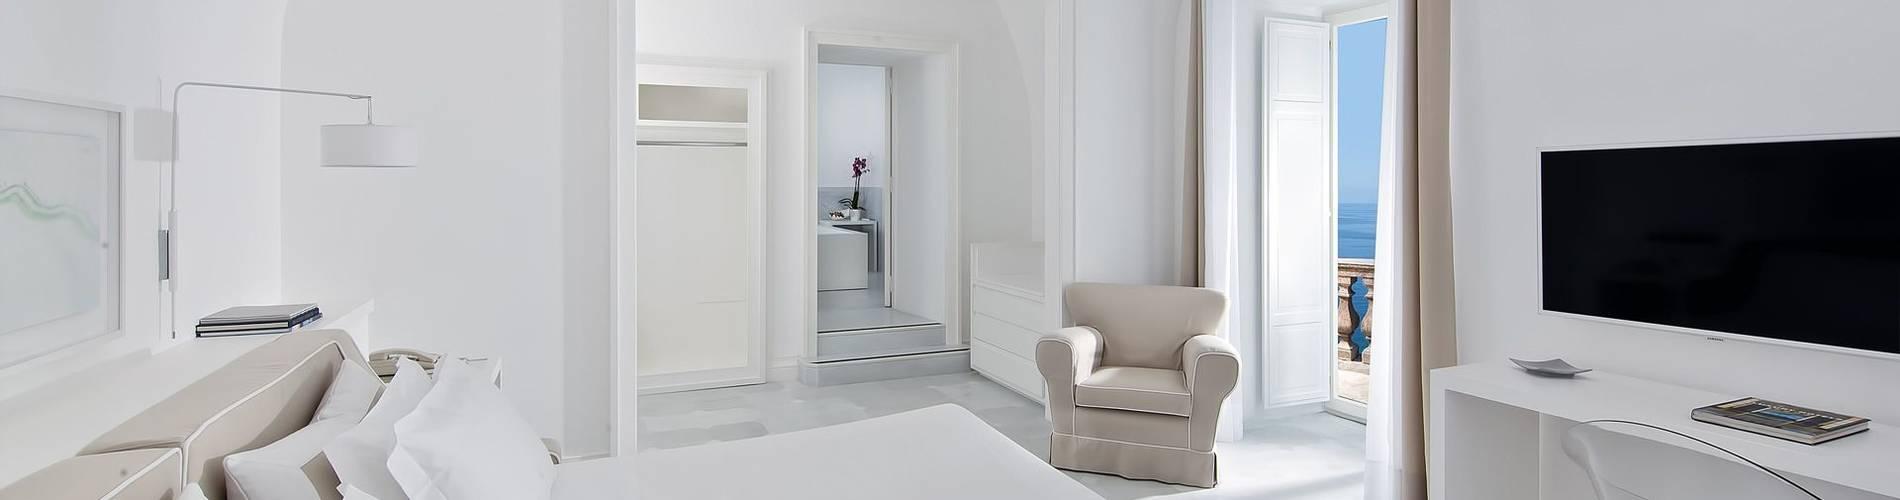 Bellevue Syrene, Sorrento, Italy, Lady Hamilton Suite (3).jpg